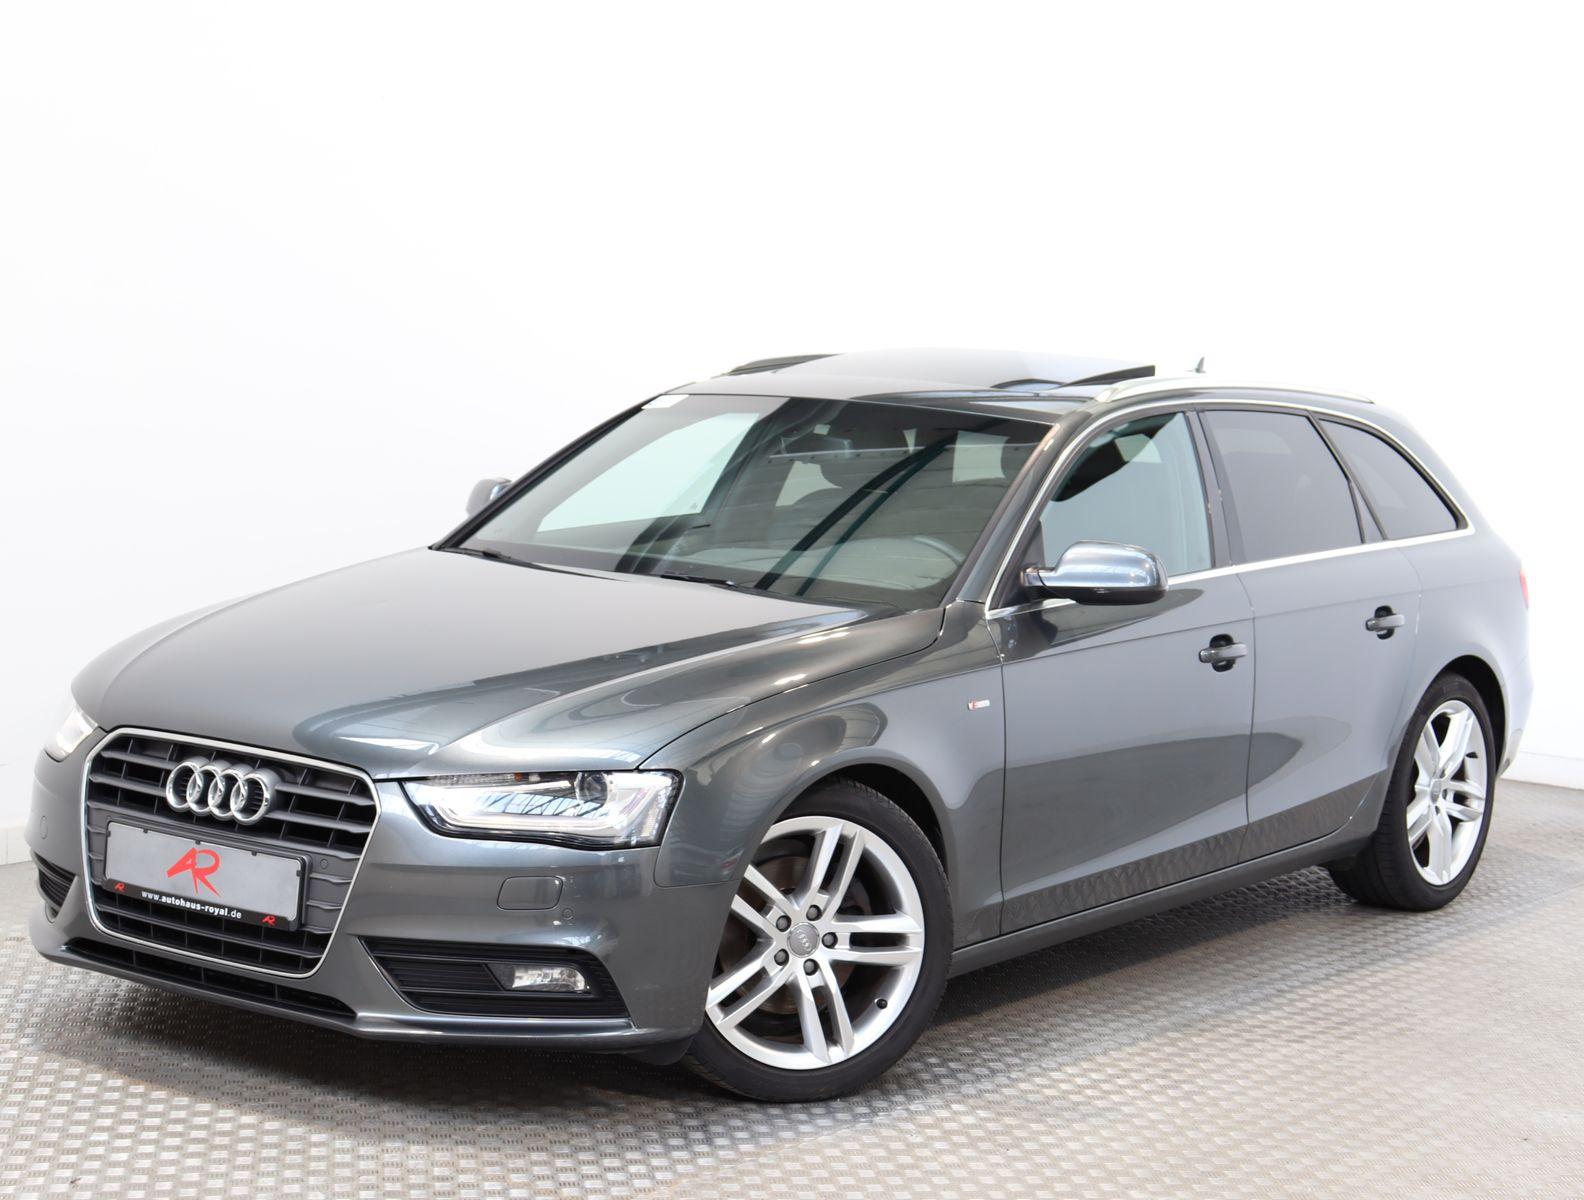 Audi A4 Avant 2.0 TDI S LINE EURO6,DACHHIMMEL SCHWARZ, Jahr 2015, Diesel